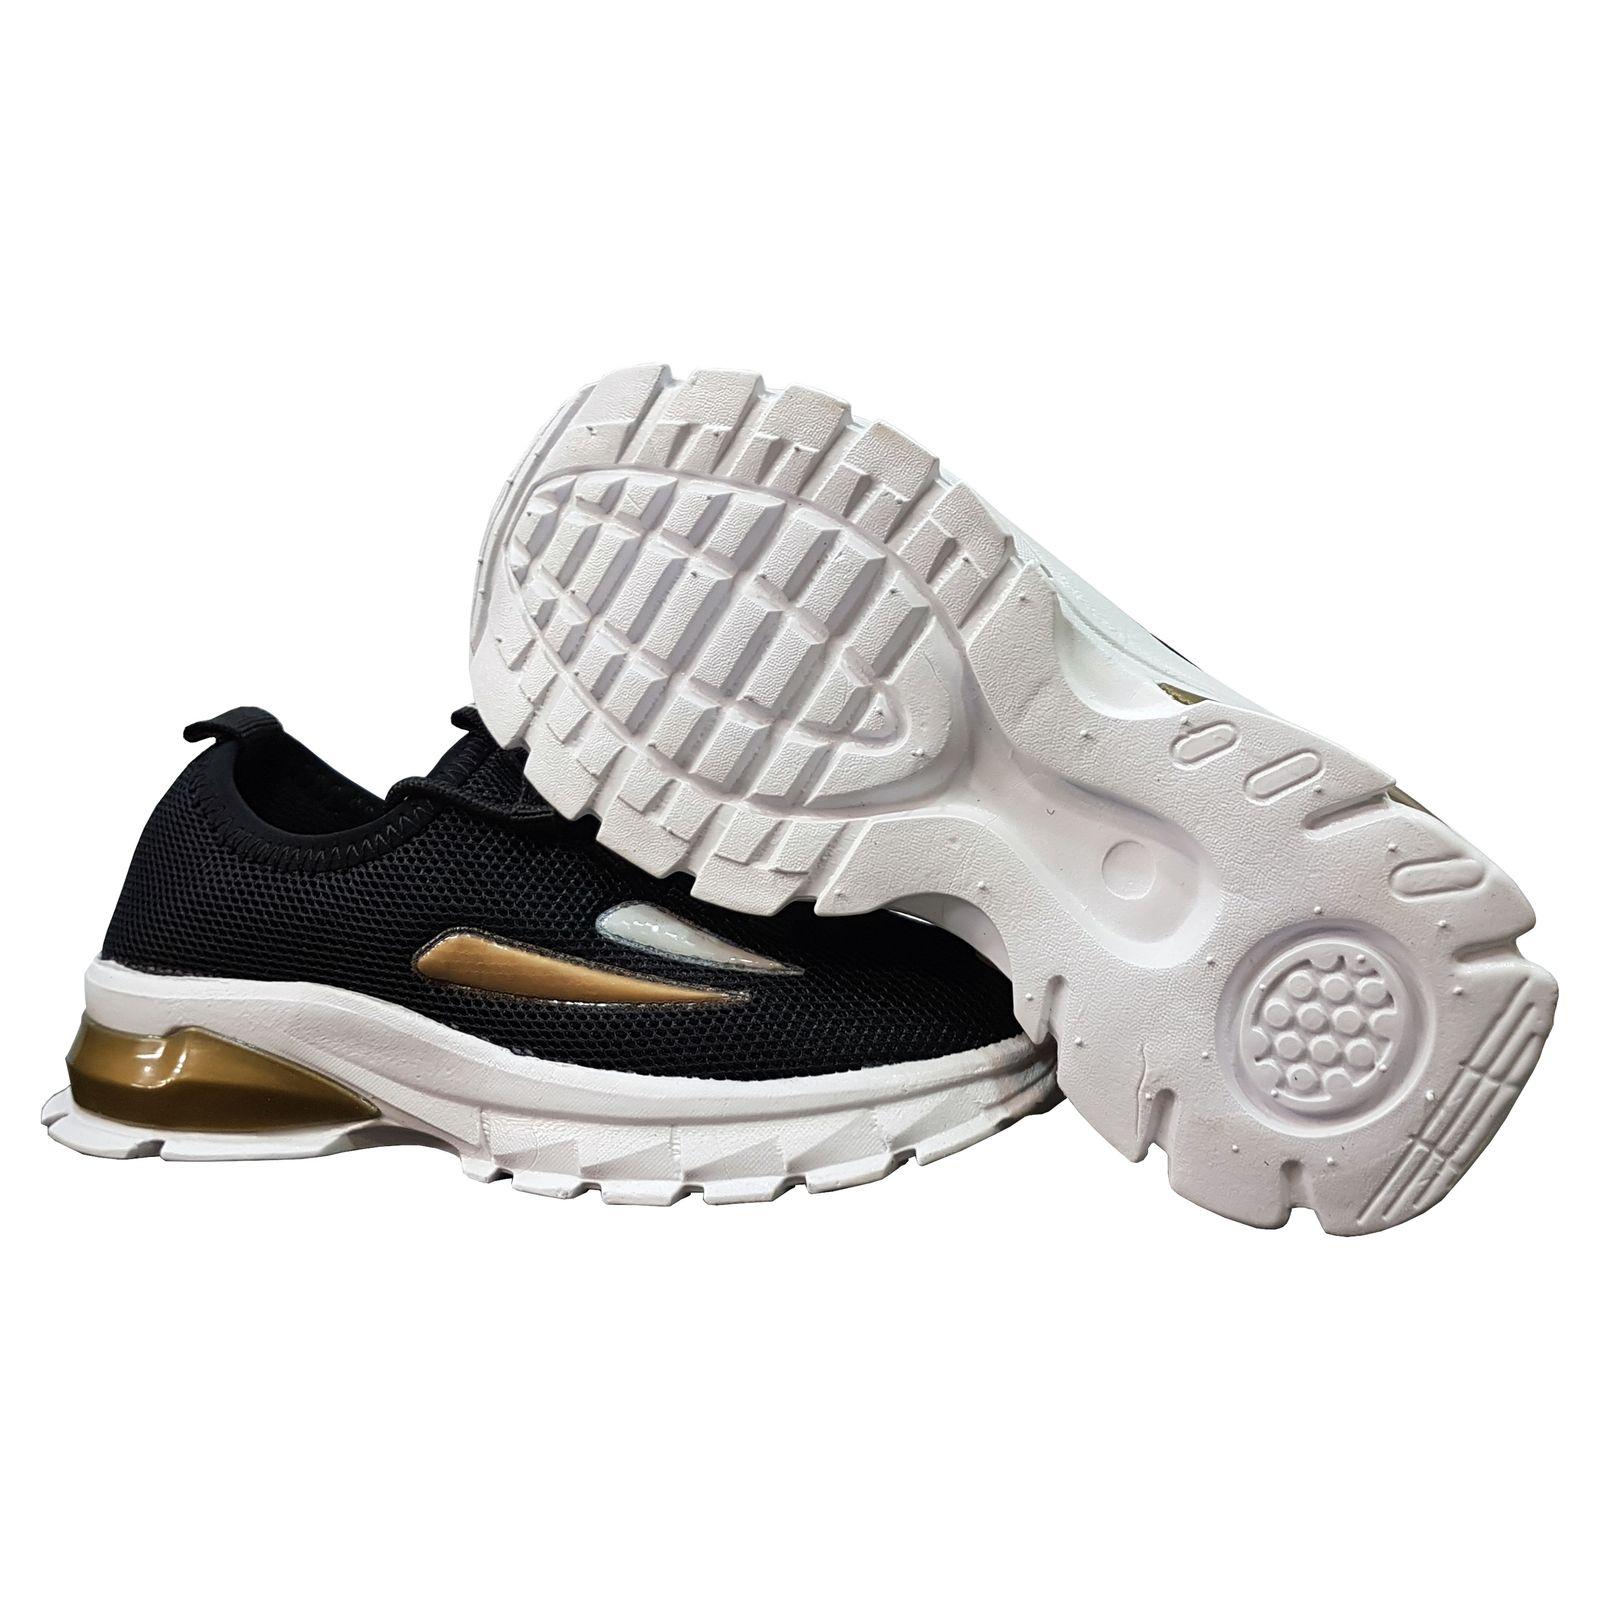 کفش پیاده روی پسرانه کد 3328129 -  - 5